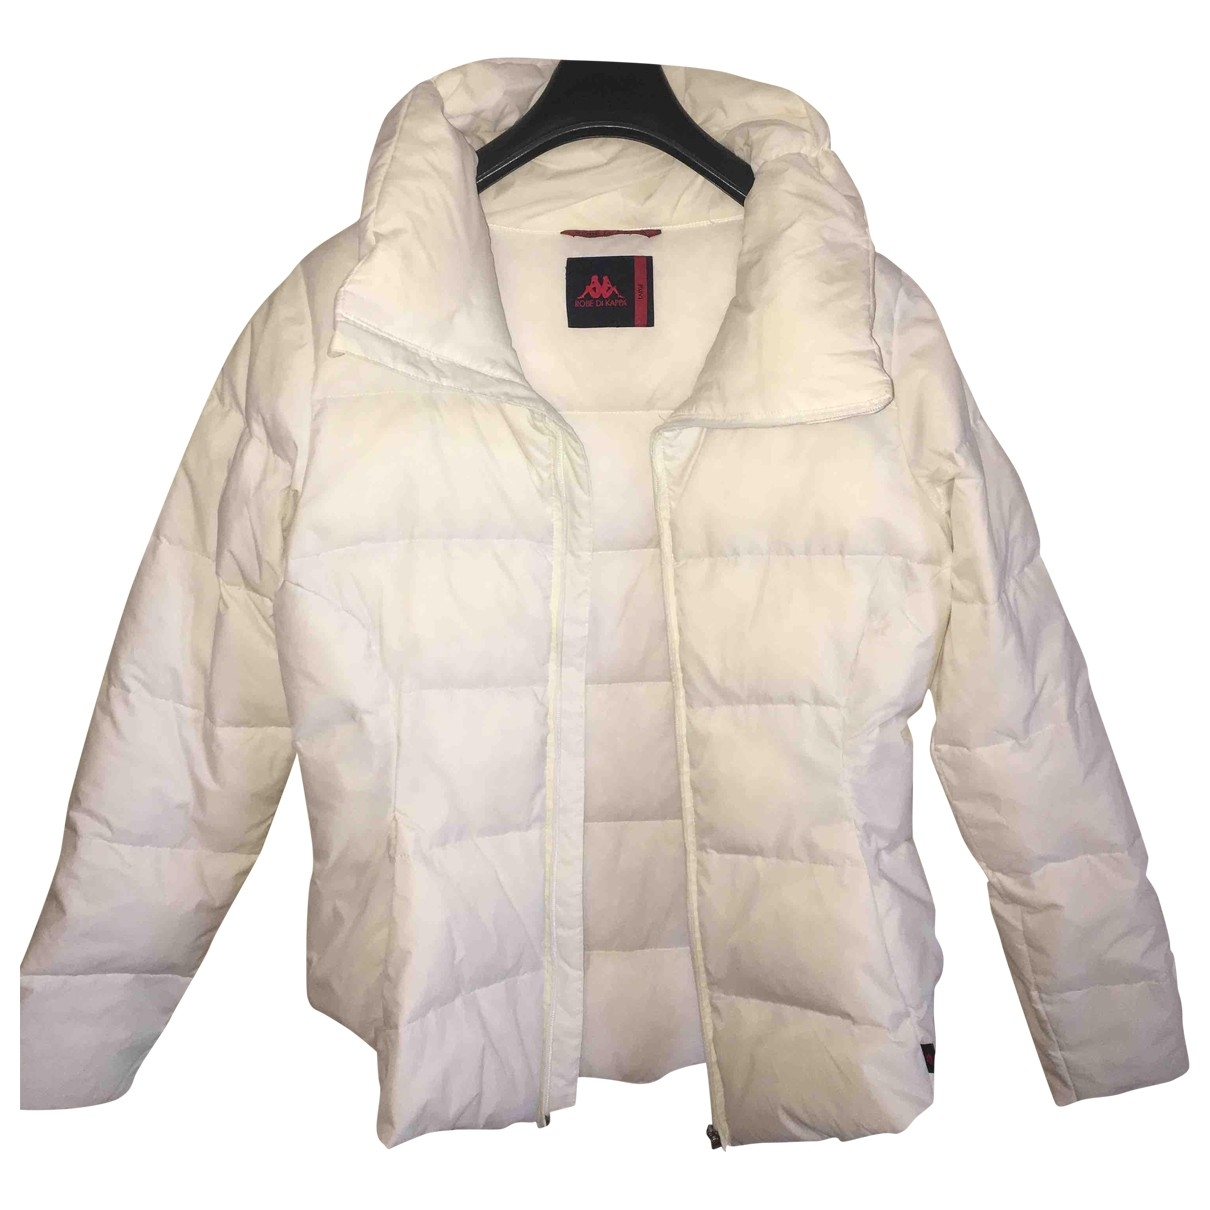 Kappa \N White Fur jacket for Women L International